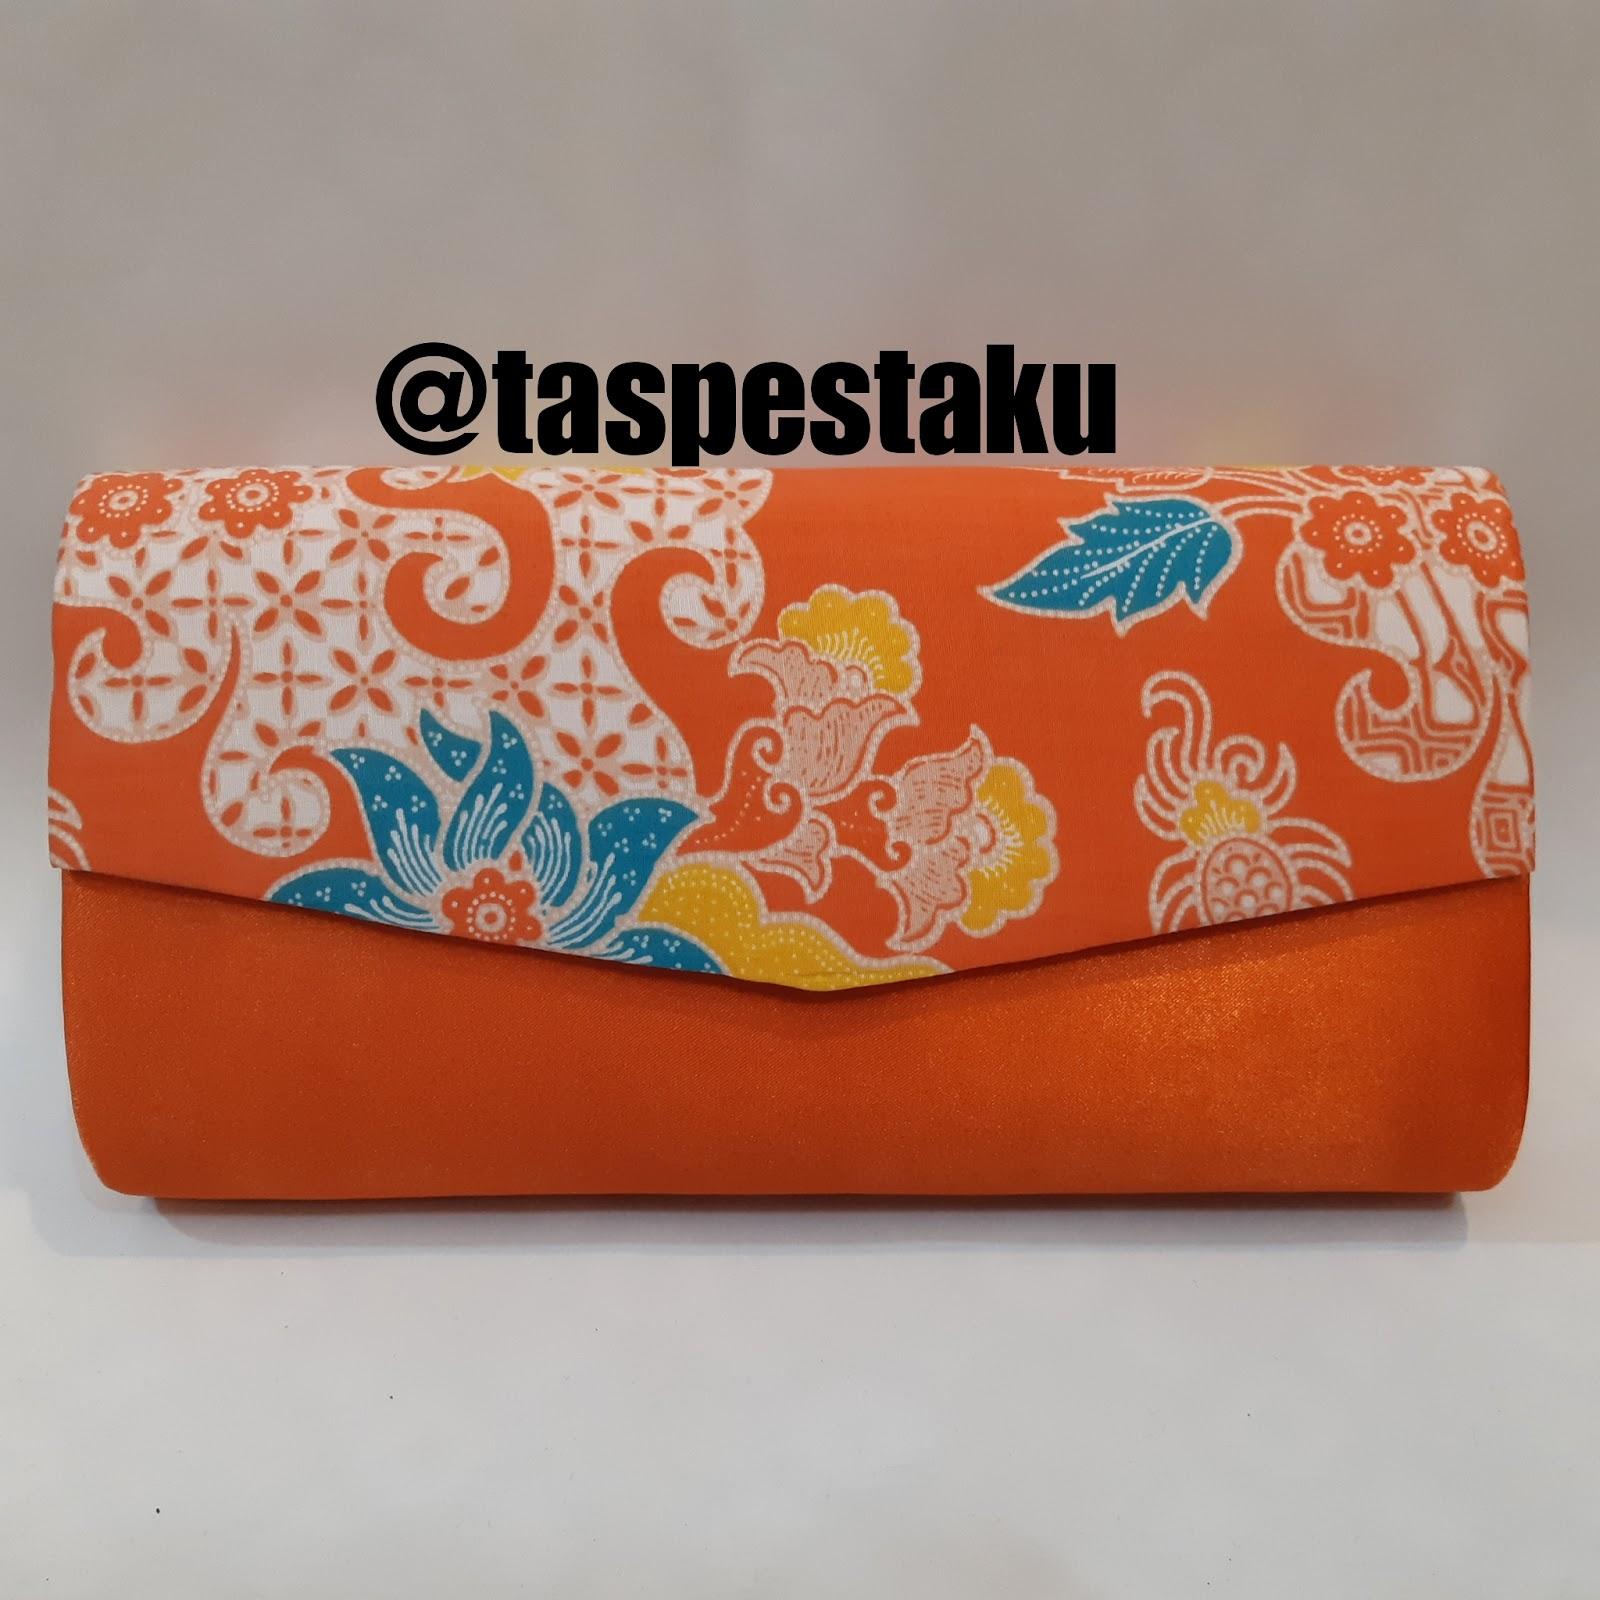 Tas Pesta - Clutch Bag  taspestaku  Koleksi Tas Pesta Oren Batik ... 592038d1d2